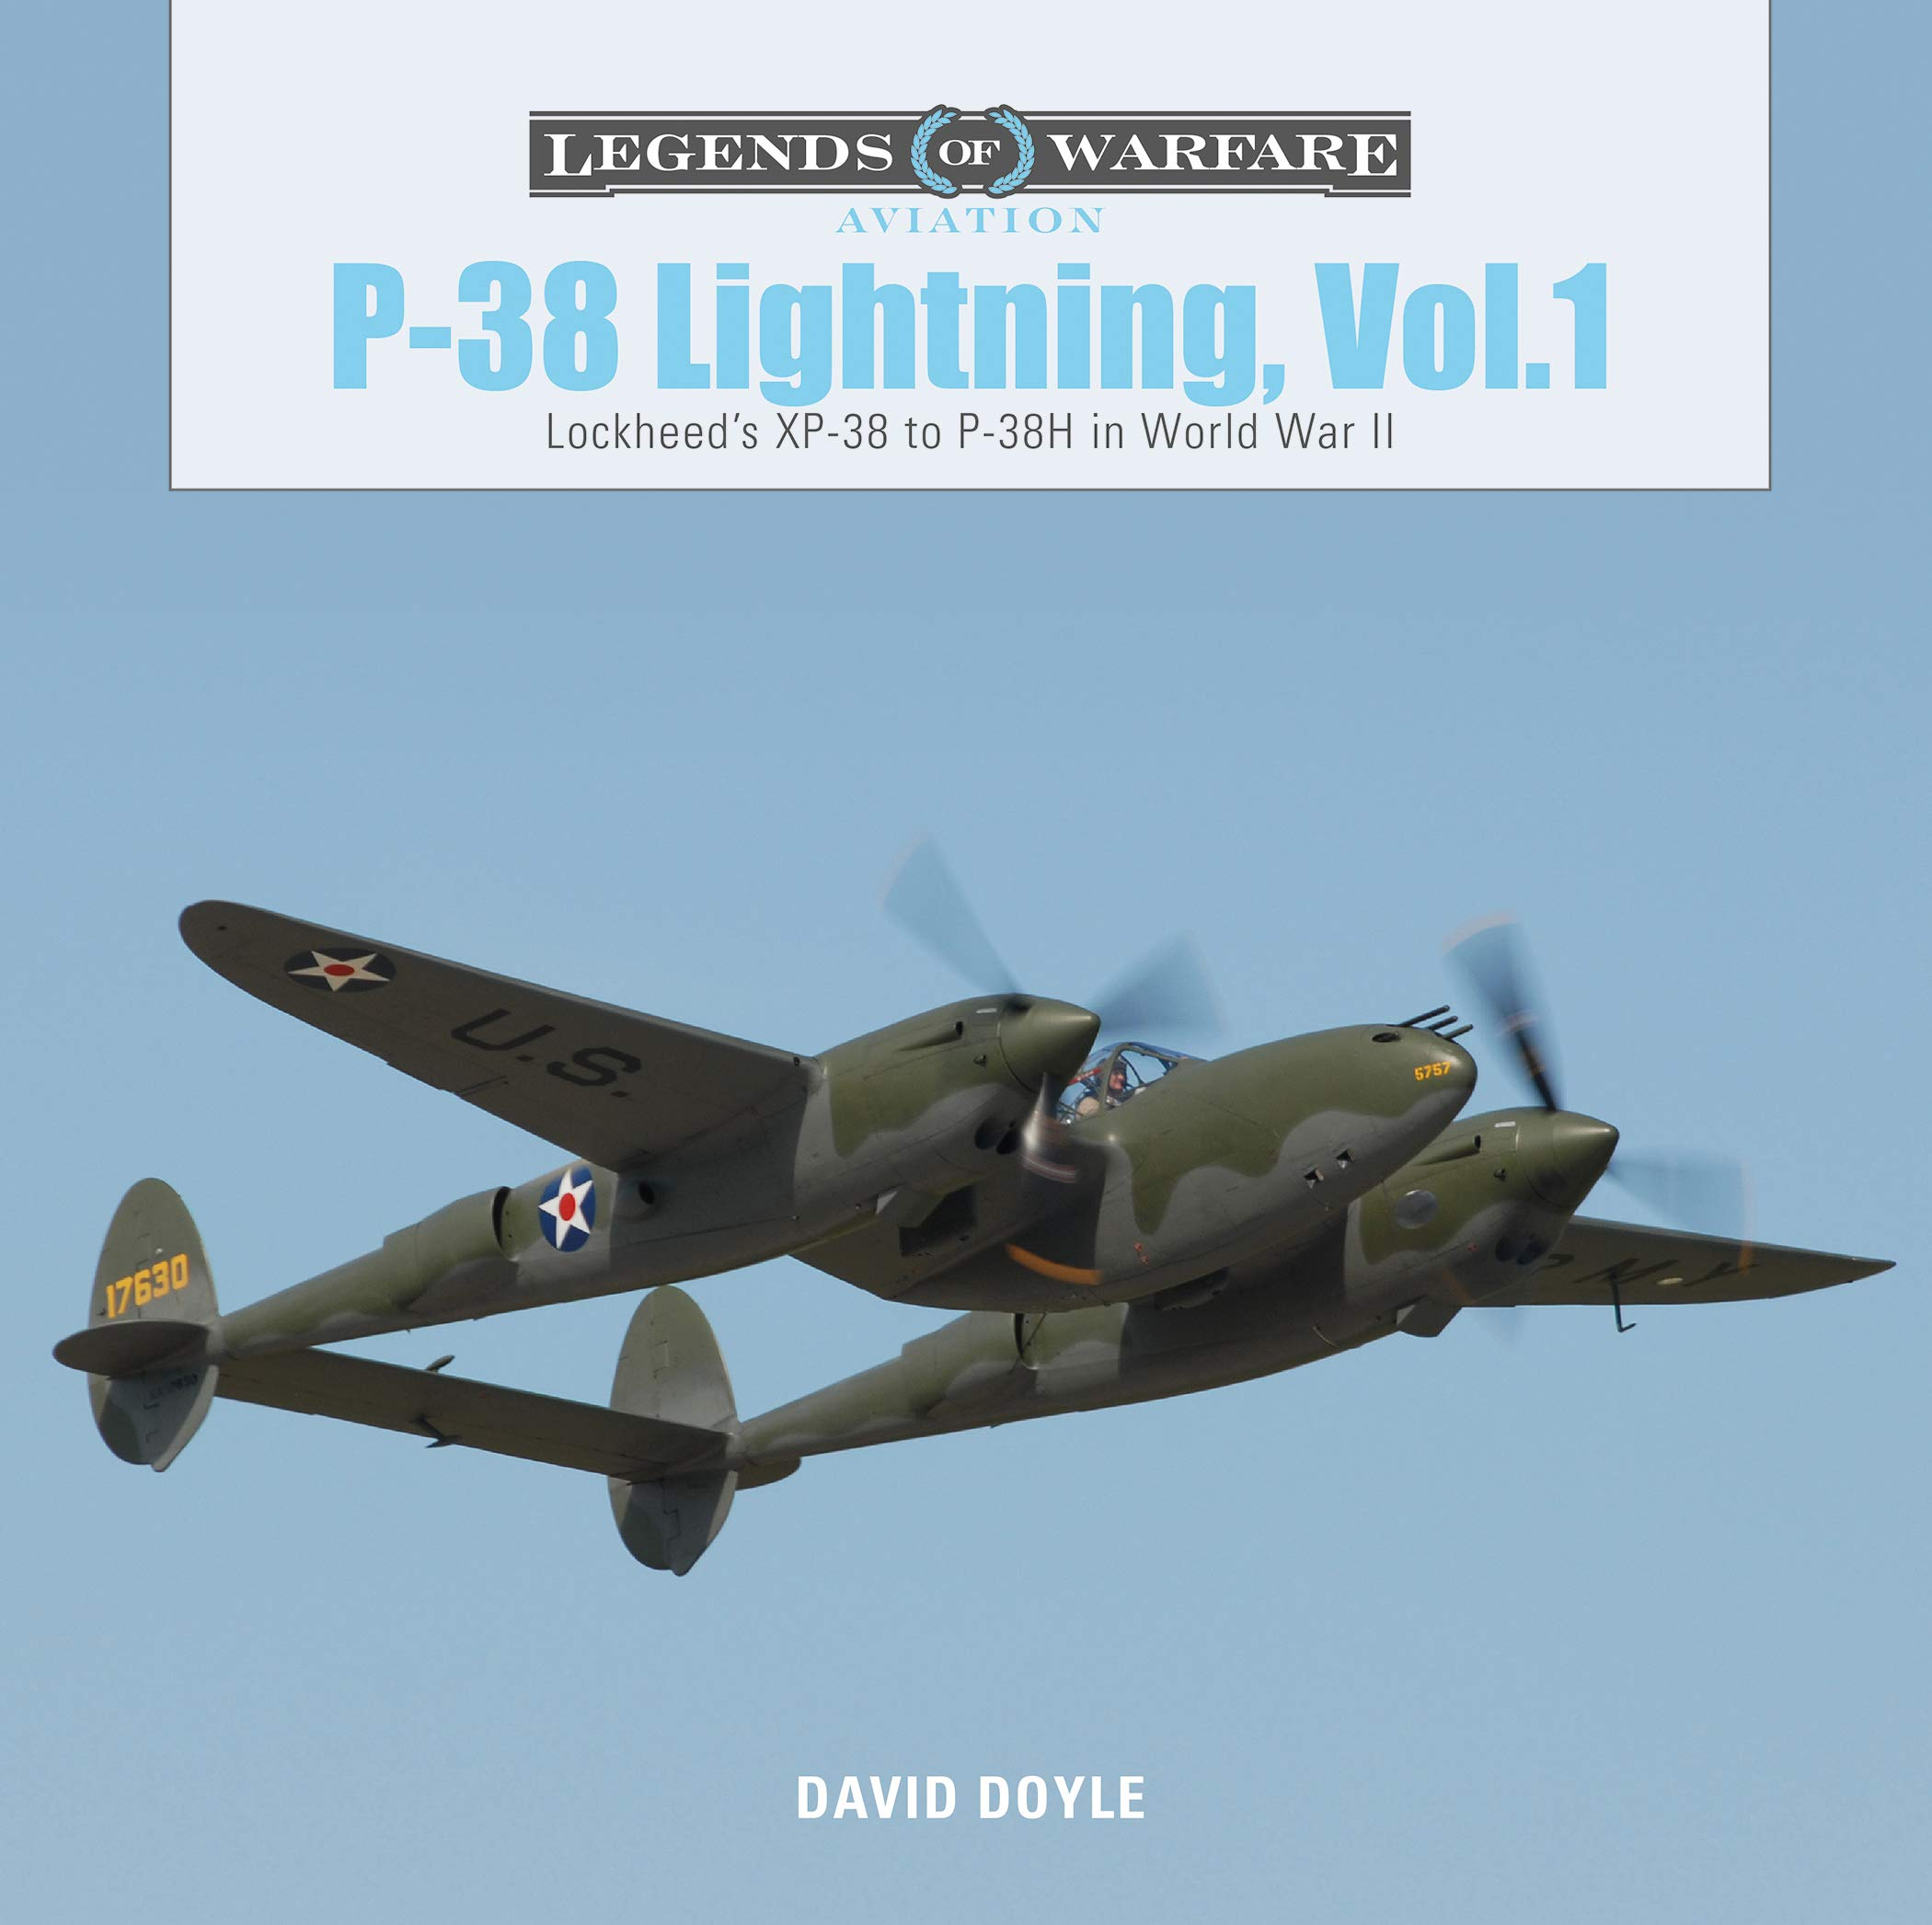 P38 Lightning Vol.1  Lockheed's XP38 To P38H In World War II  Legends Of Warfare  Aviation